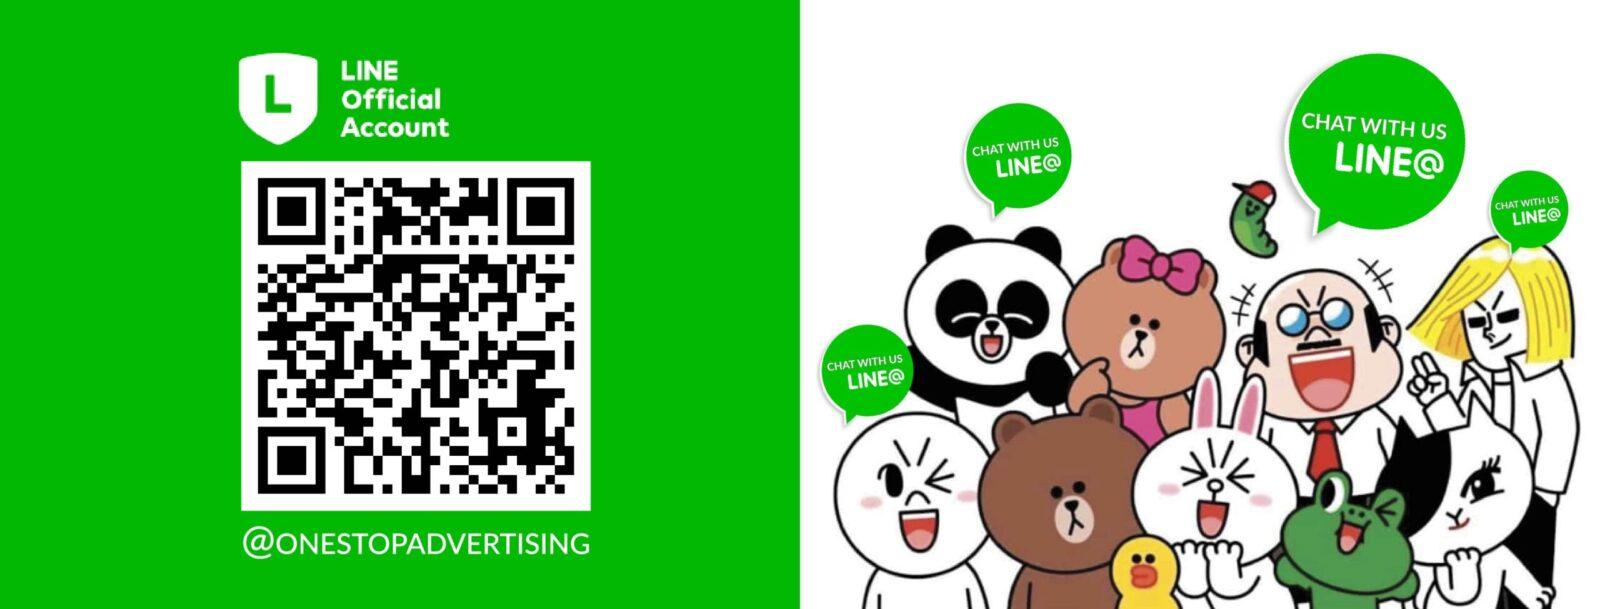 chameleon production offial line customer service qr code with line cartoon design